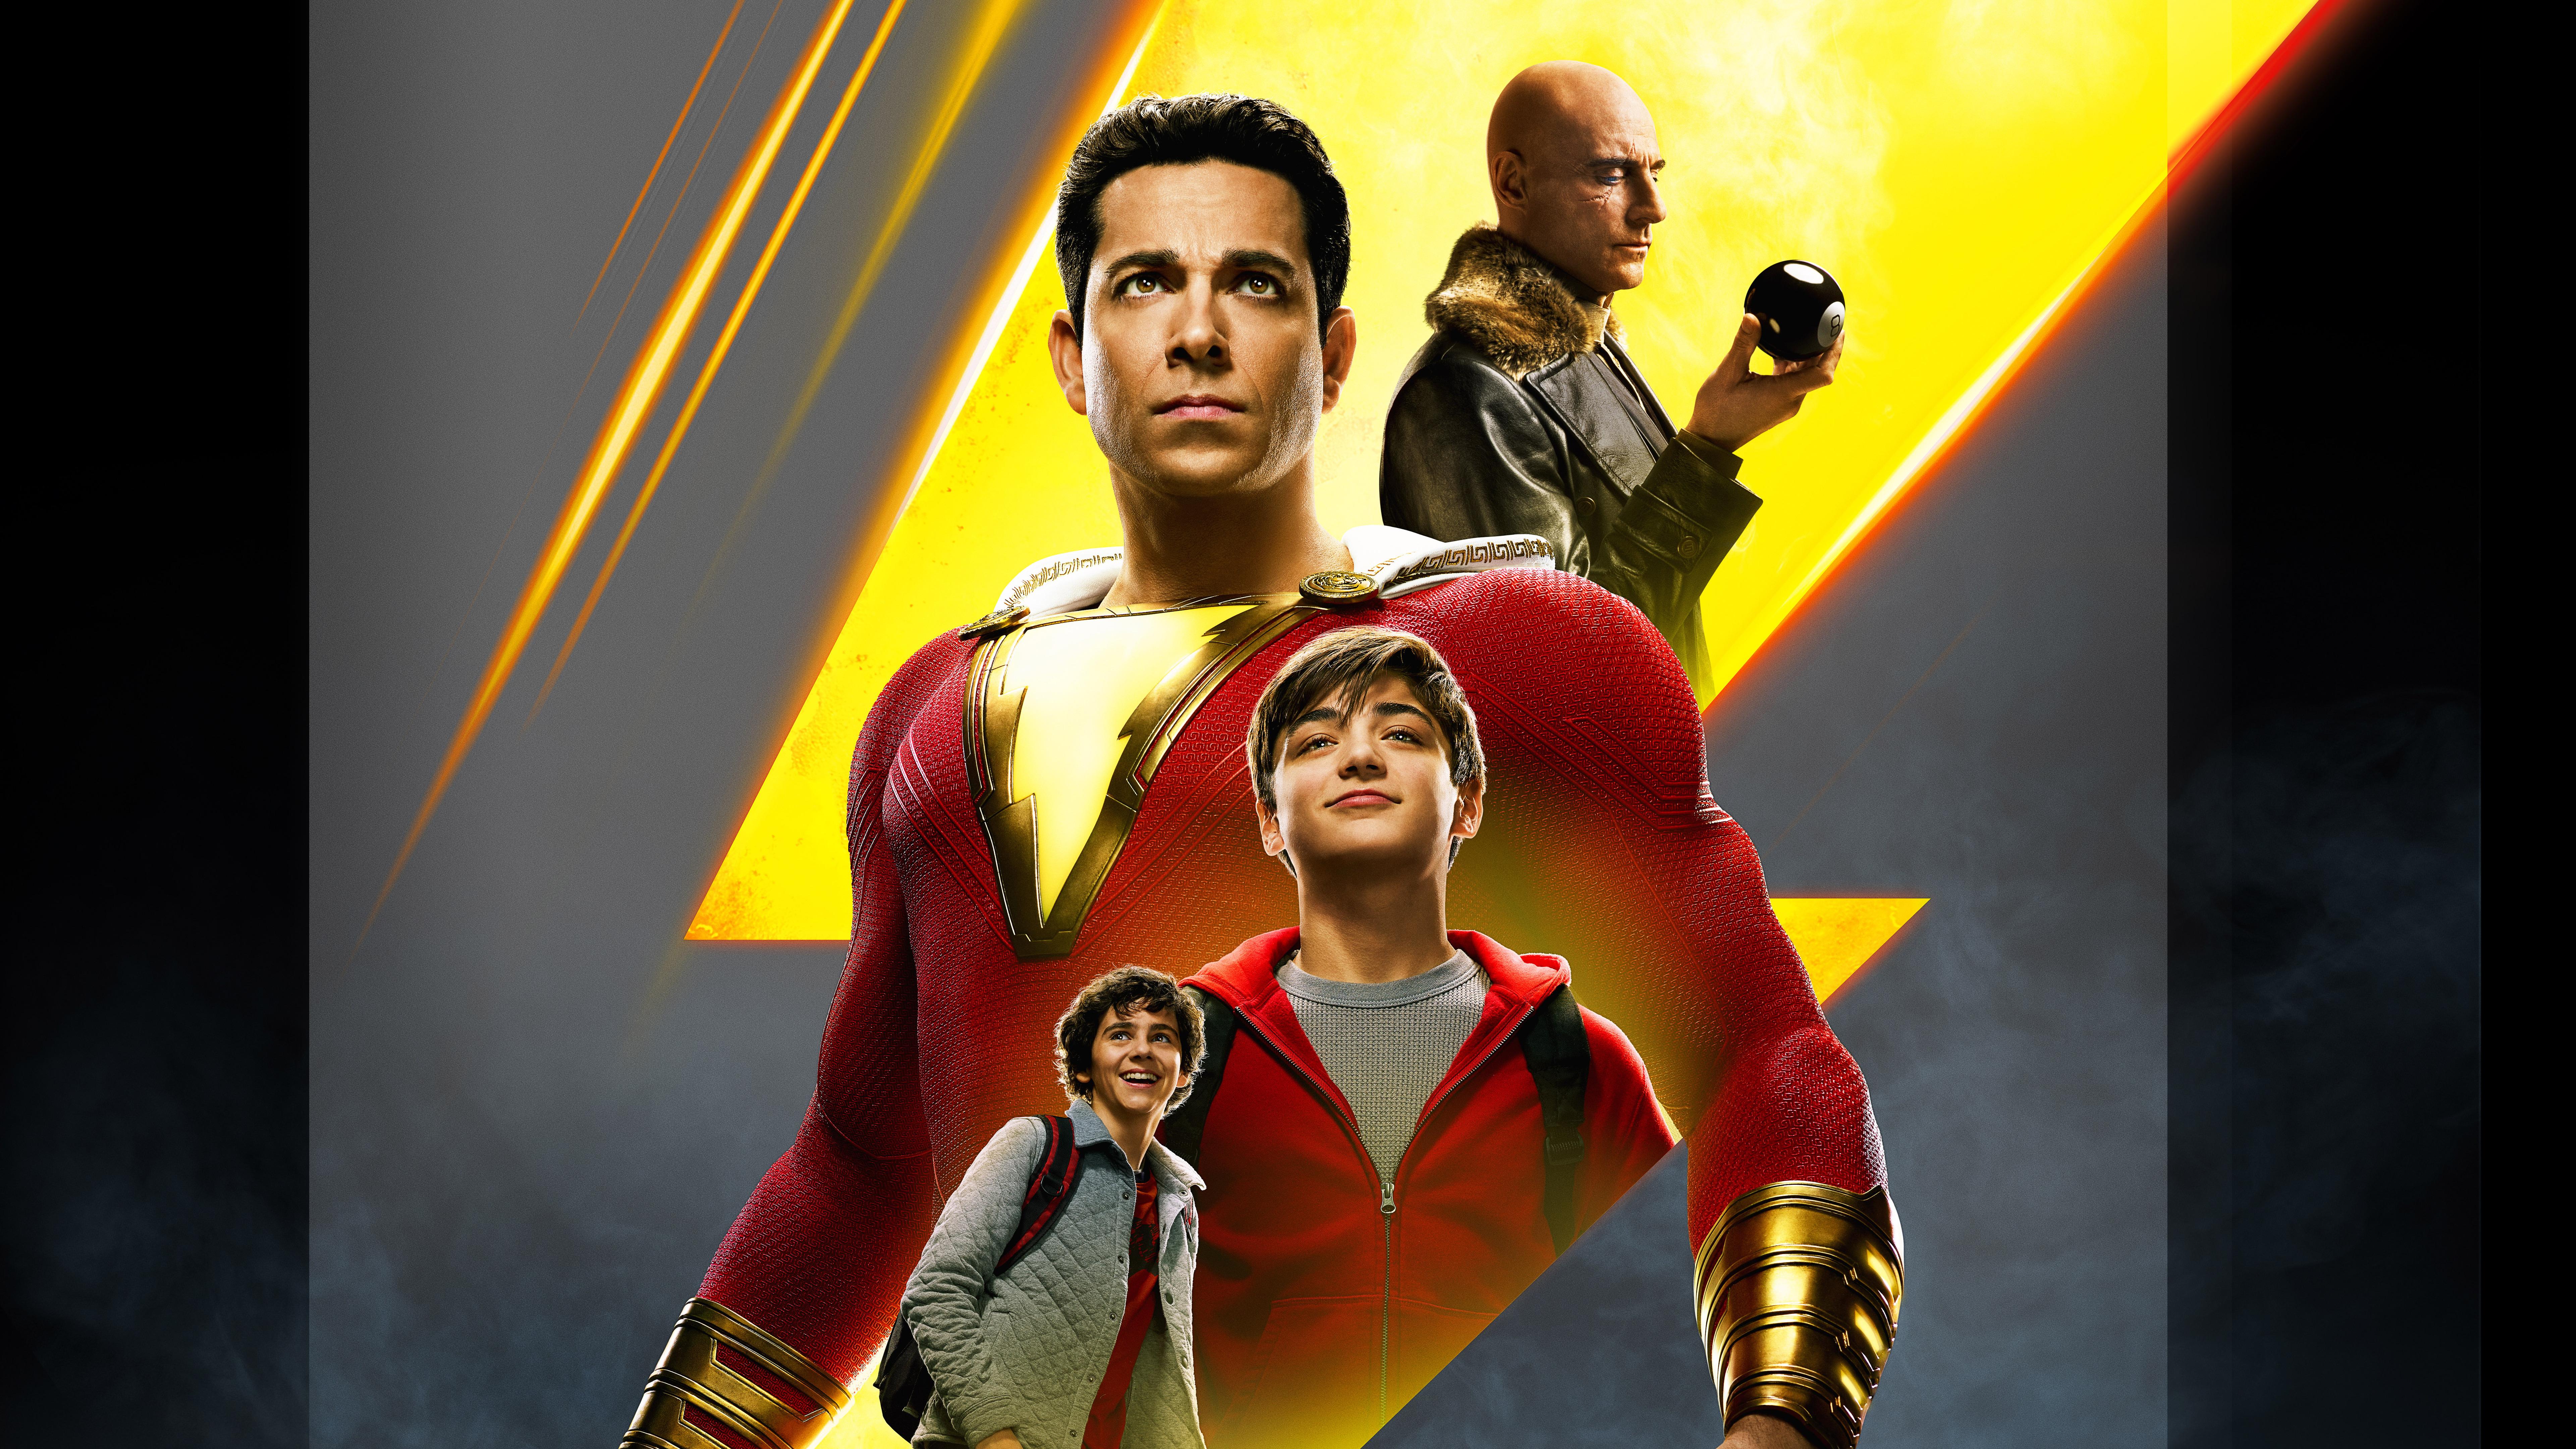 Movie Poster 2019: 7680x4320 Shazam 2019 Movie China Poster 8k HD 4k